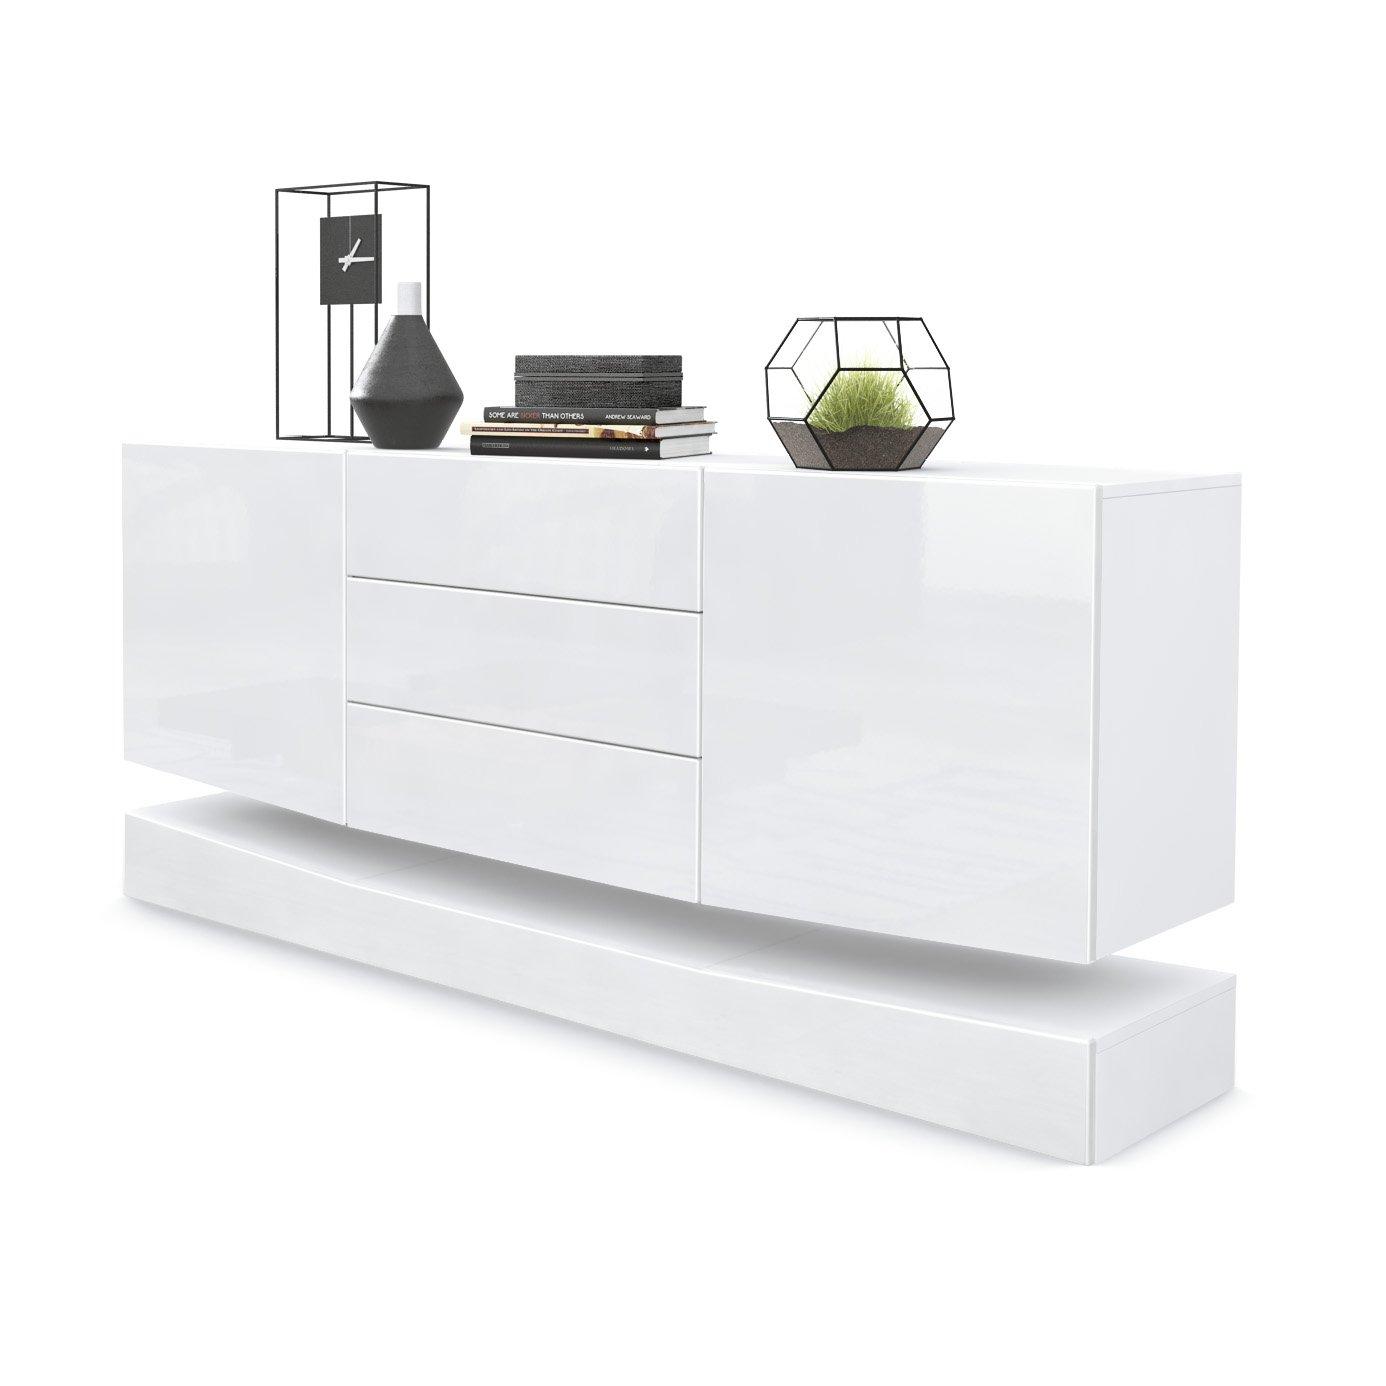 White Gloss Living Room Furniture: Amazon.co.uk